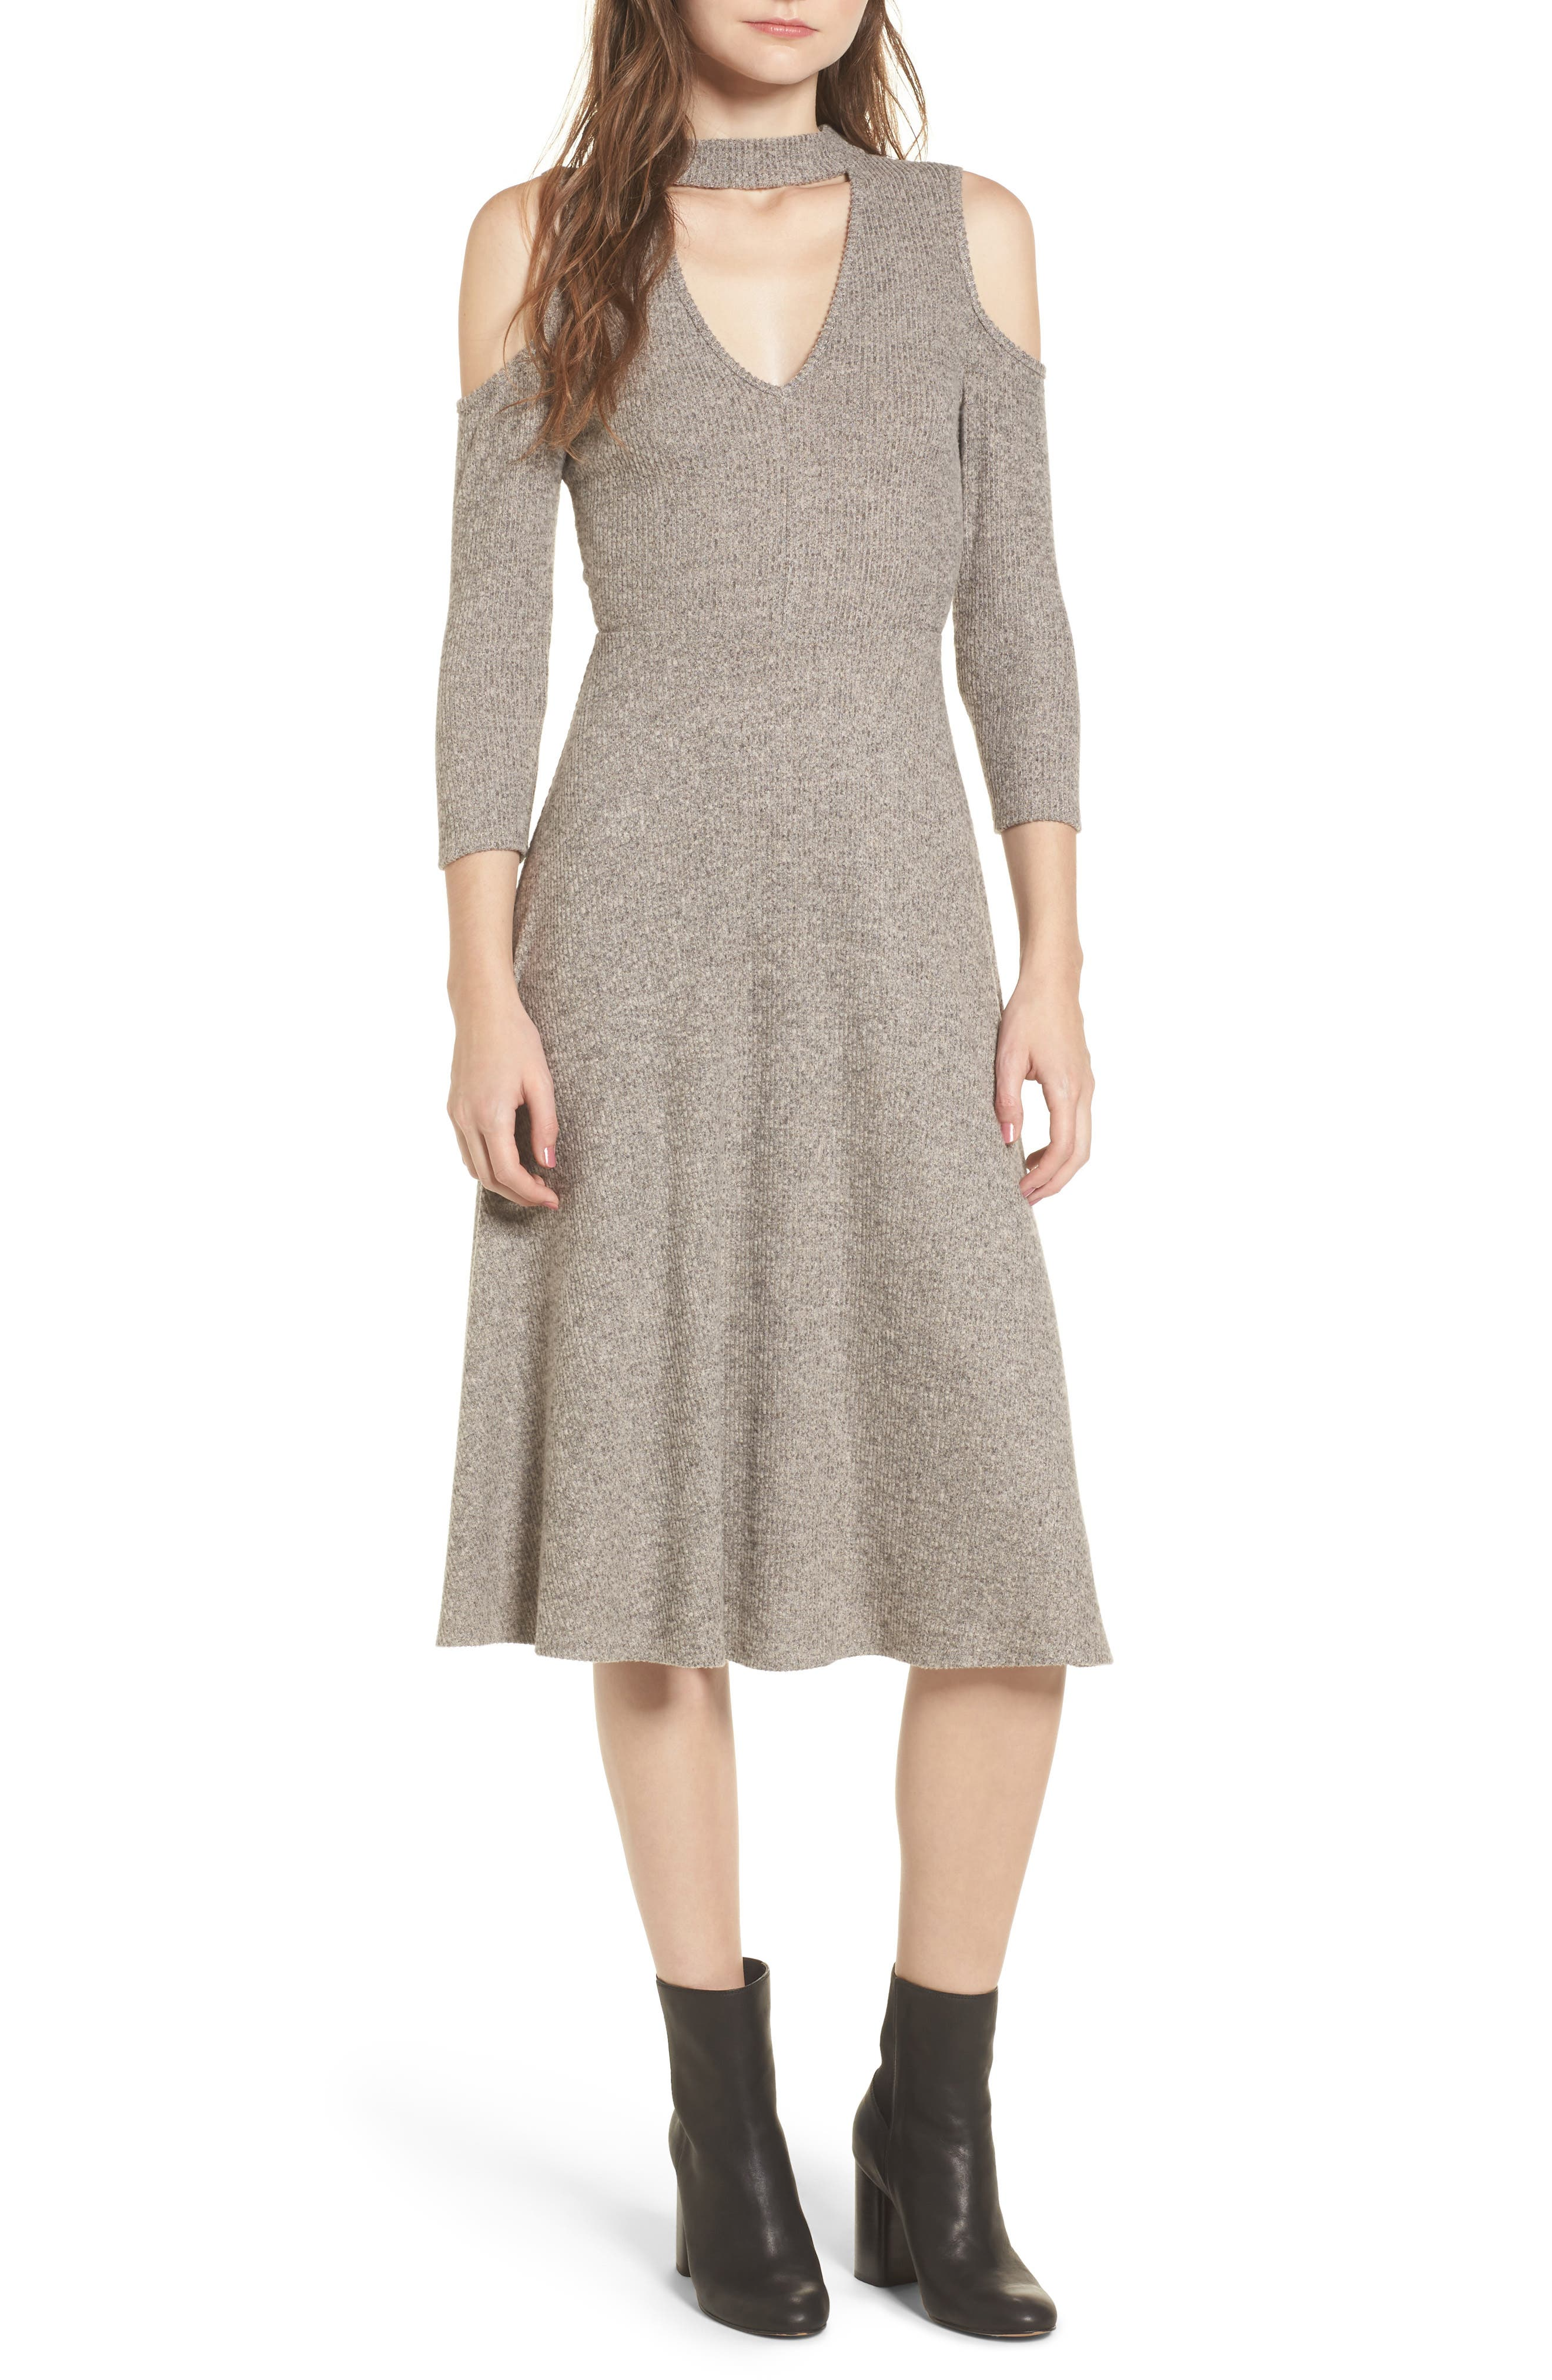 Soprano Choker Neck Cold Shoulder Midi Dress